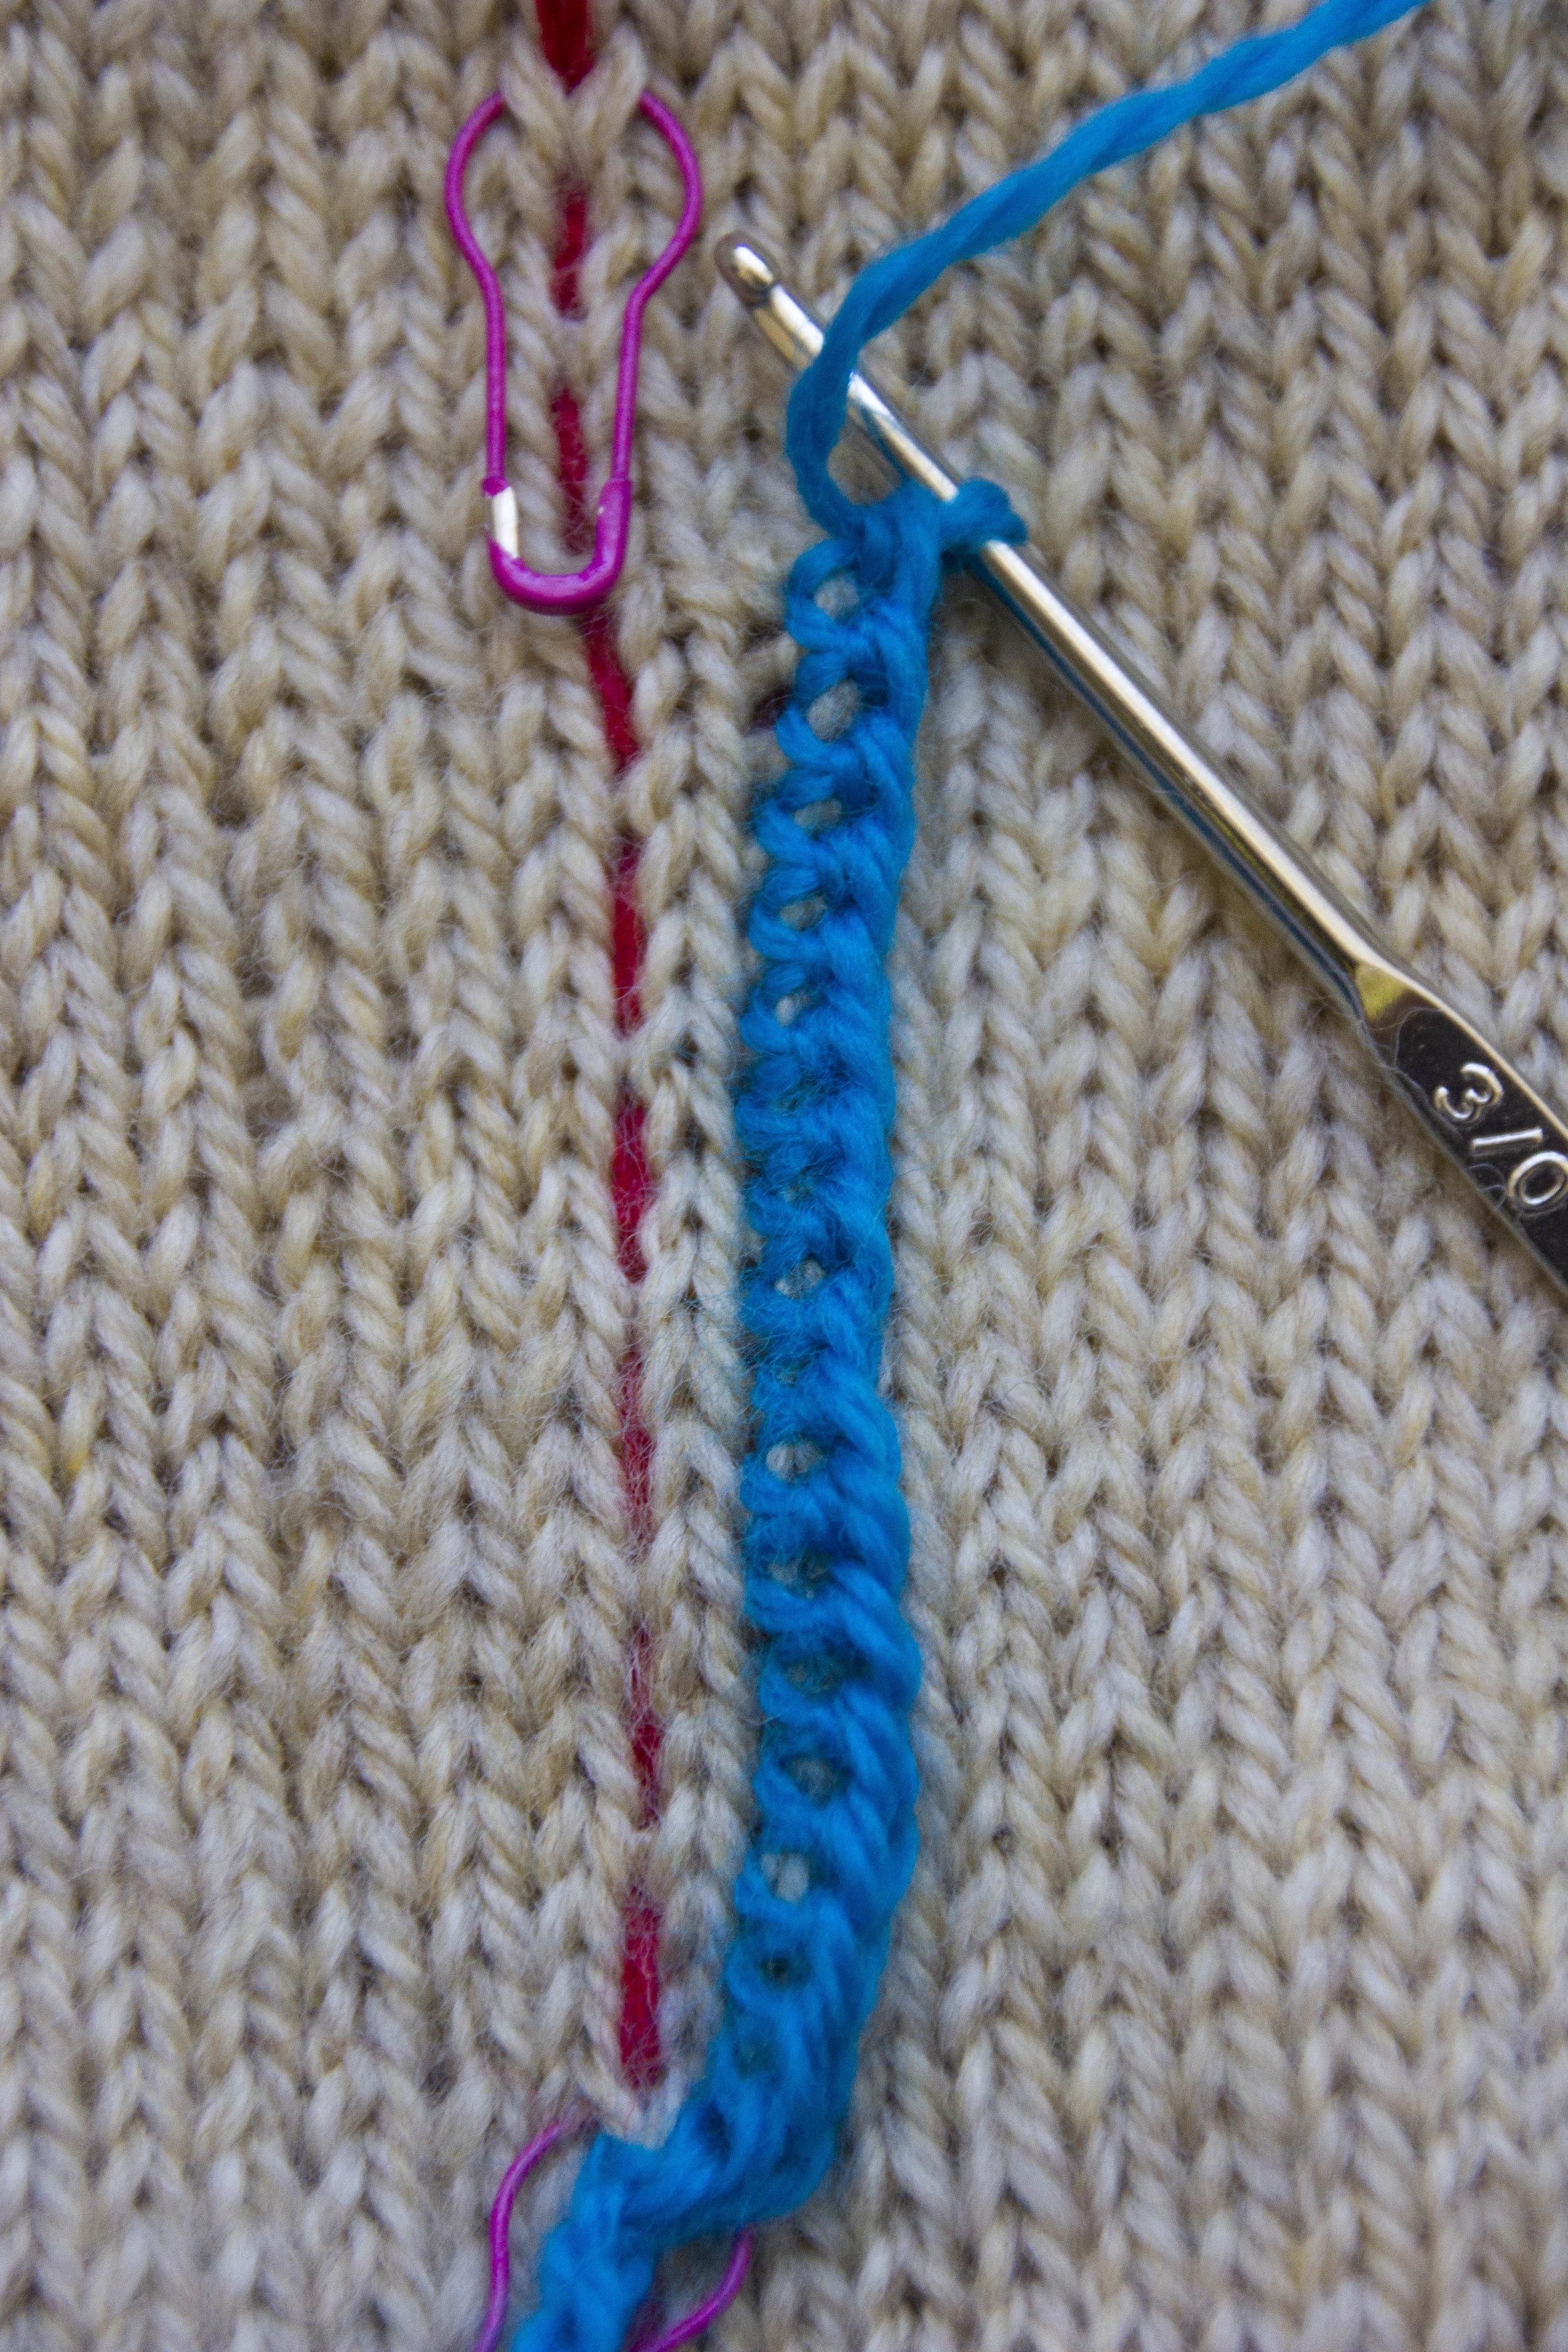 merele crochet steek 1-2.jpg